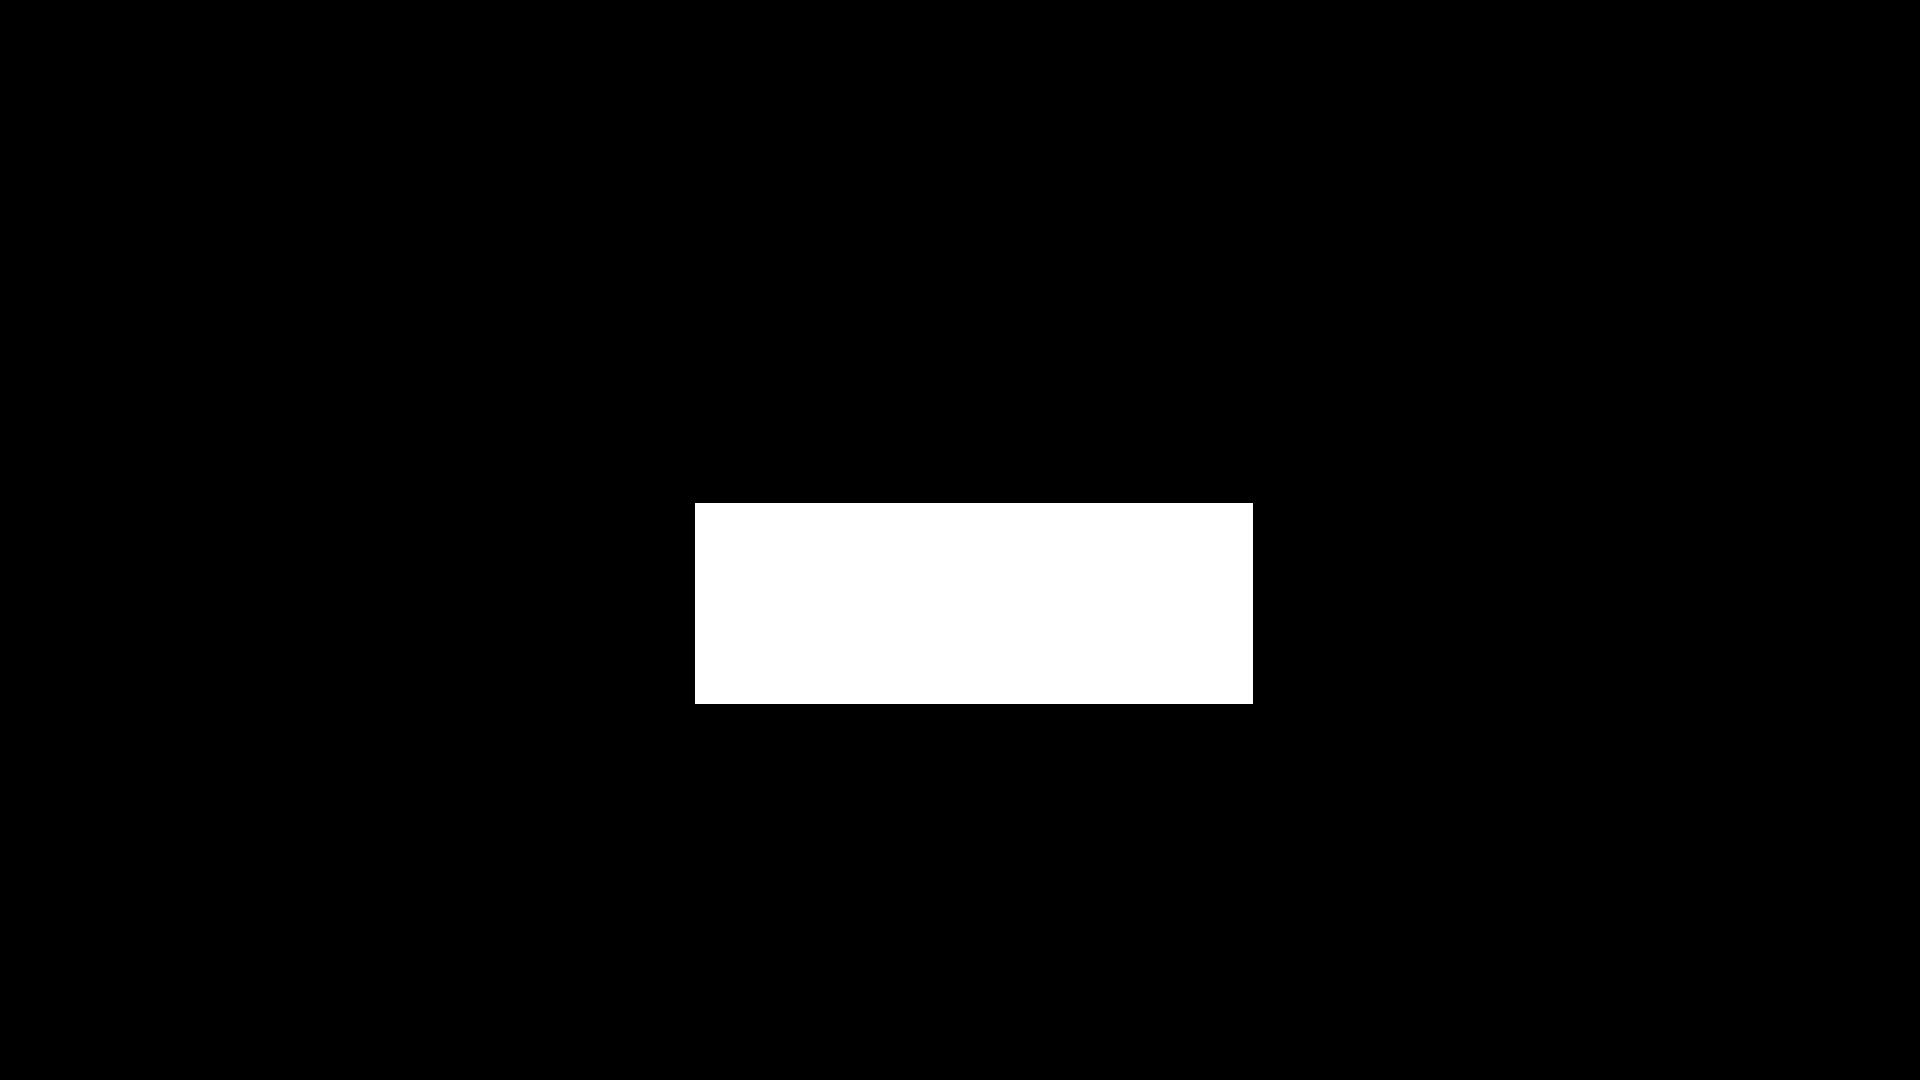 nike tick logo